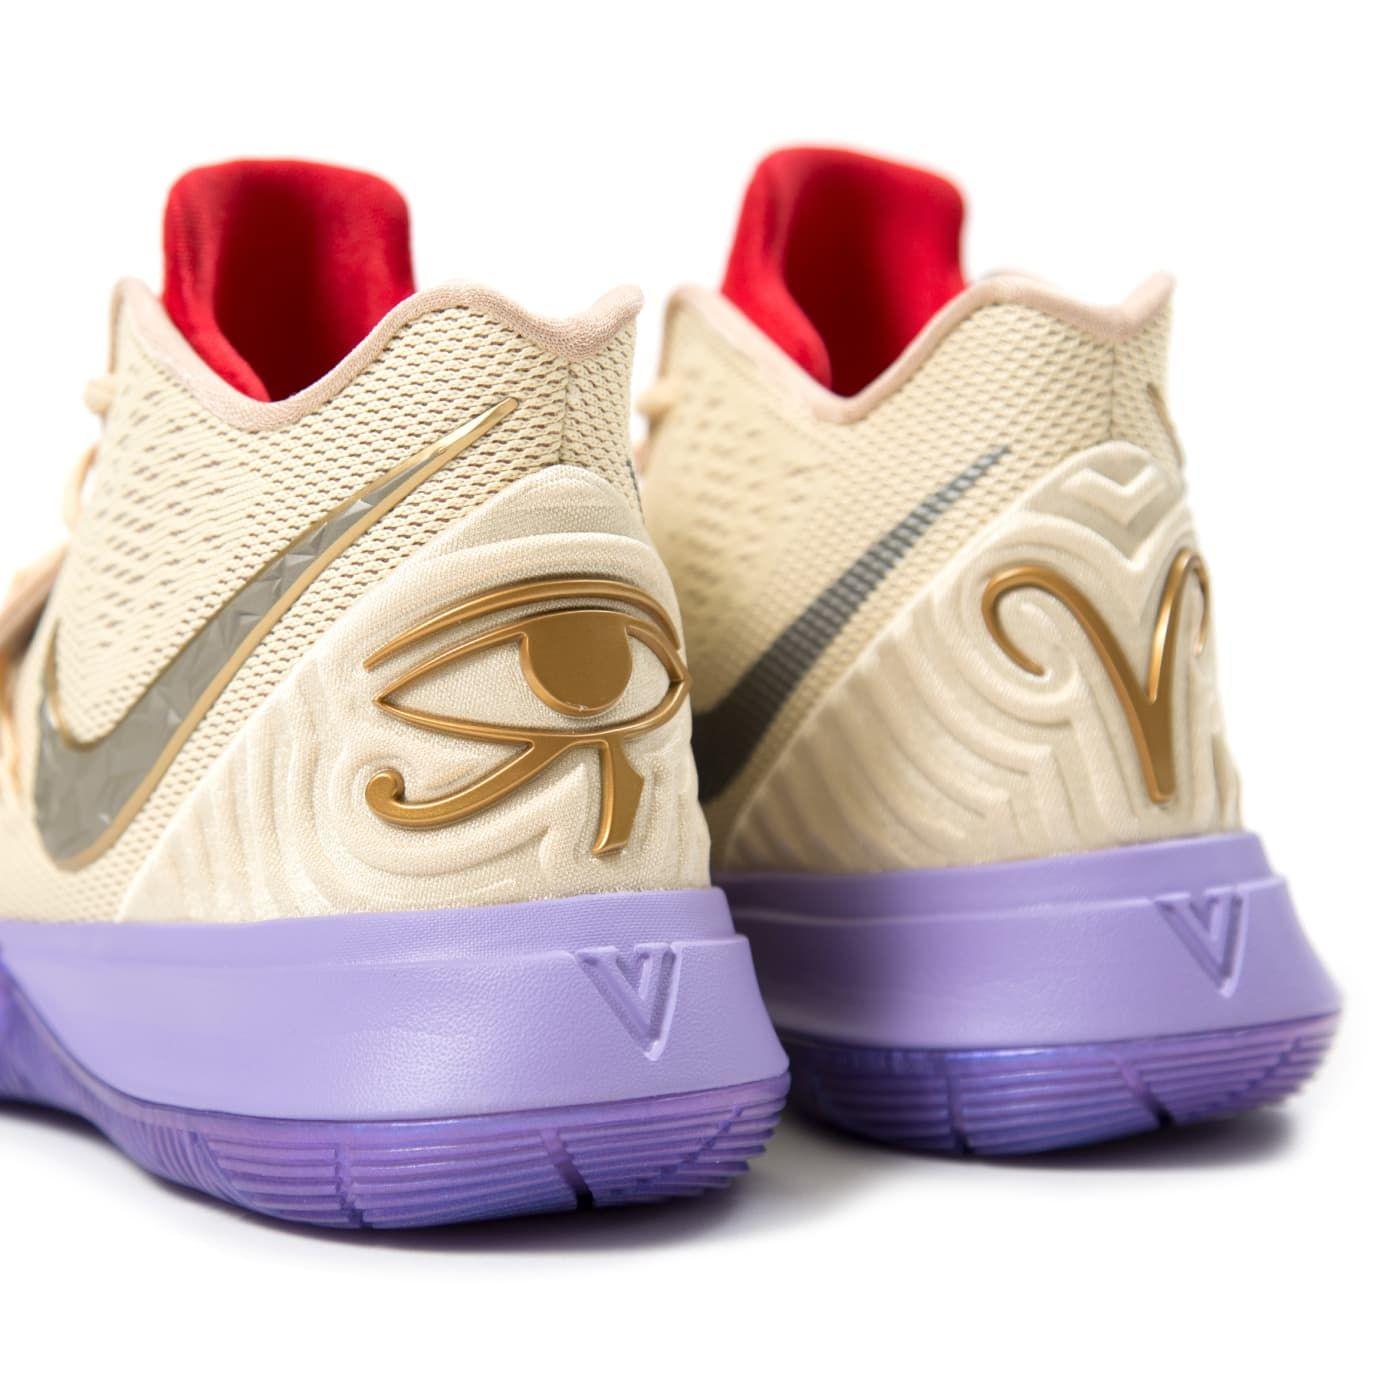 8df3077850cf Concepts x Nike Kyrie 5  Ikhet  (Heel)